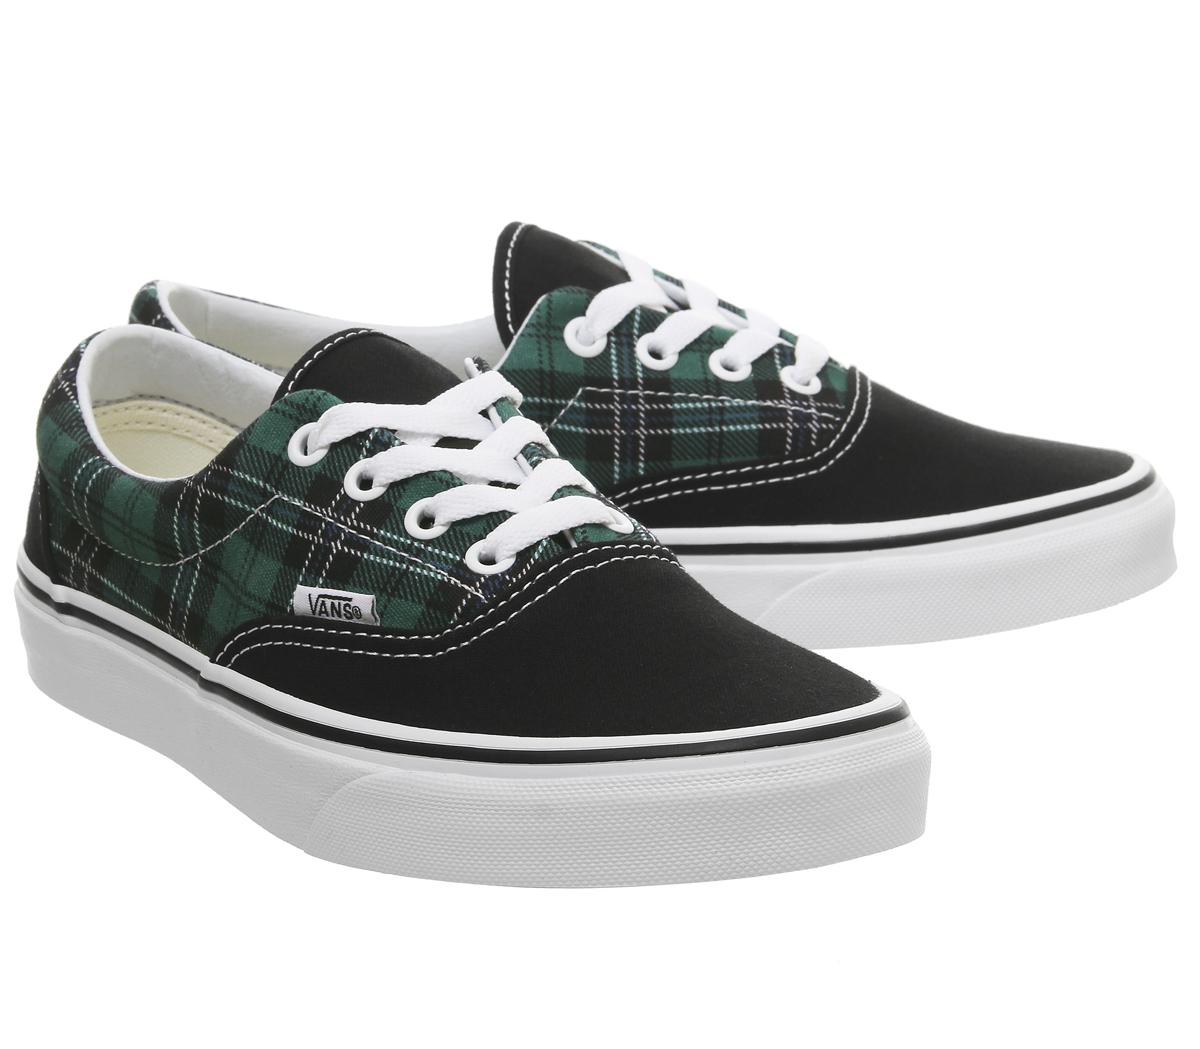 54f2e9872d9c04 Sentinel Mens Vans Era Trainers Evergreen True White Tartan Exclusive Trainers  Shoes